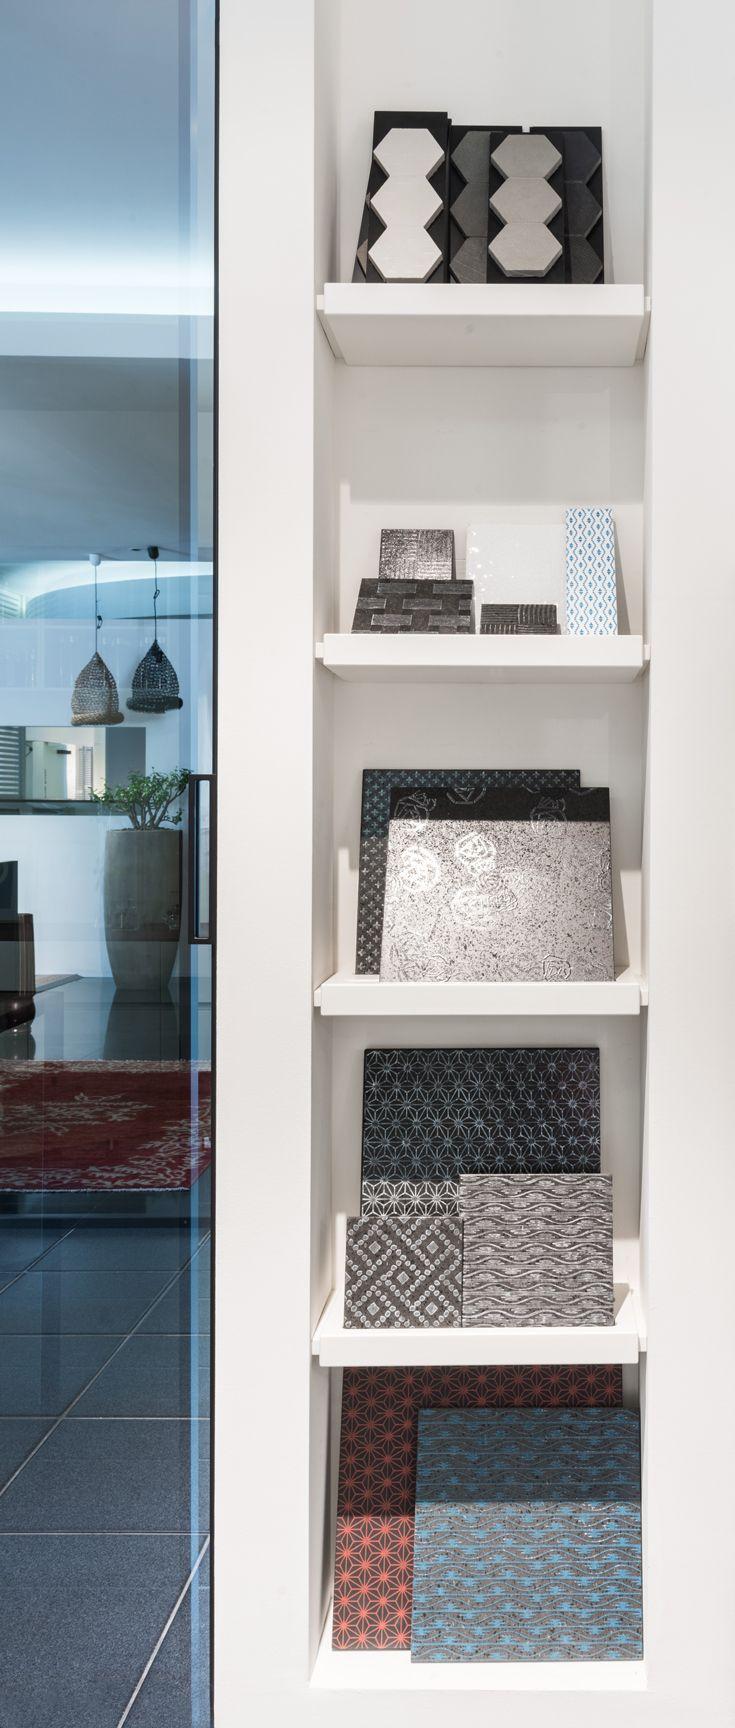 #Tiles #Space